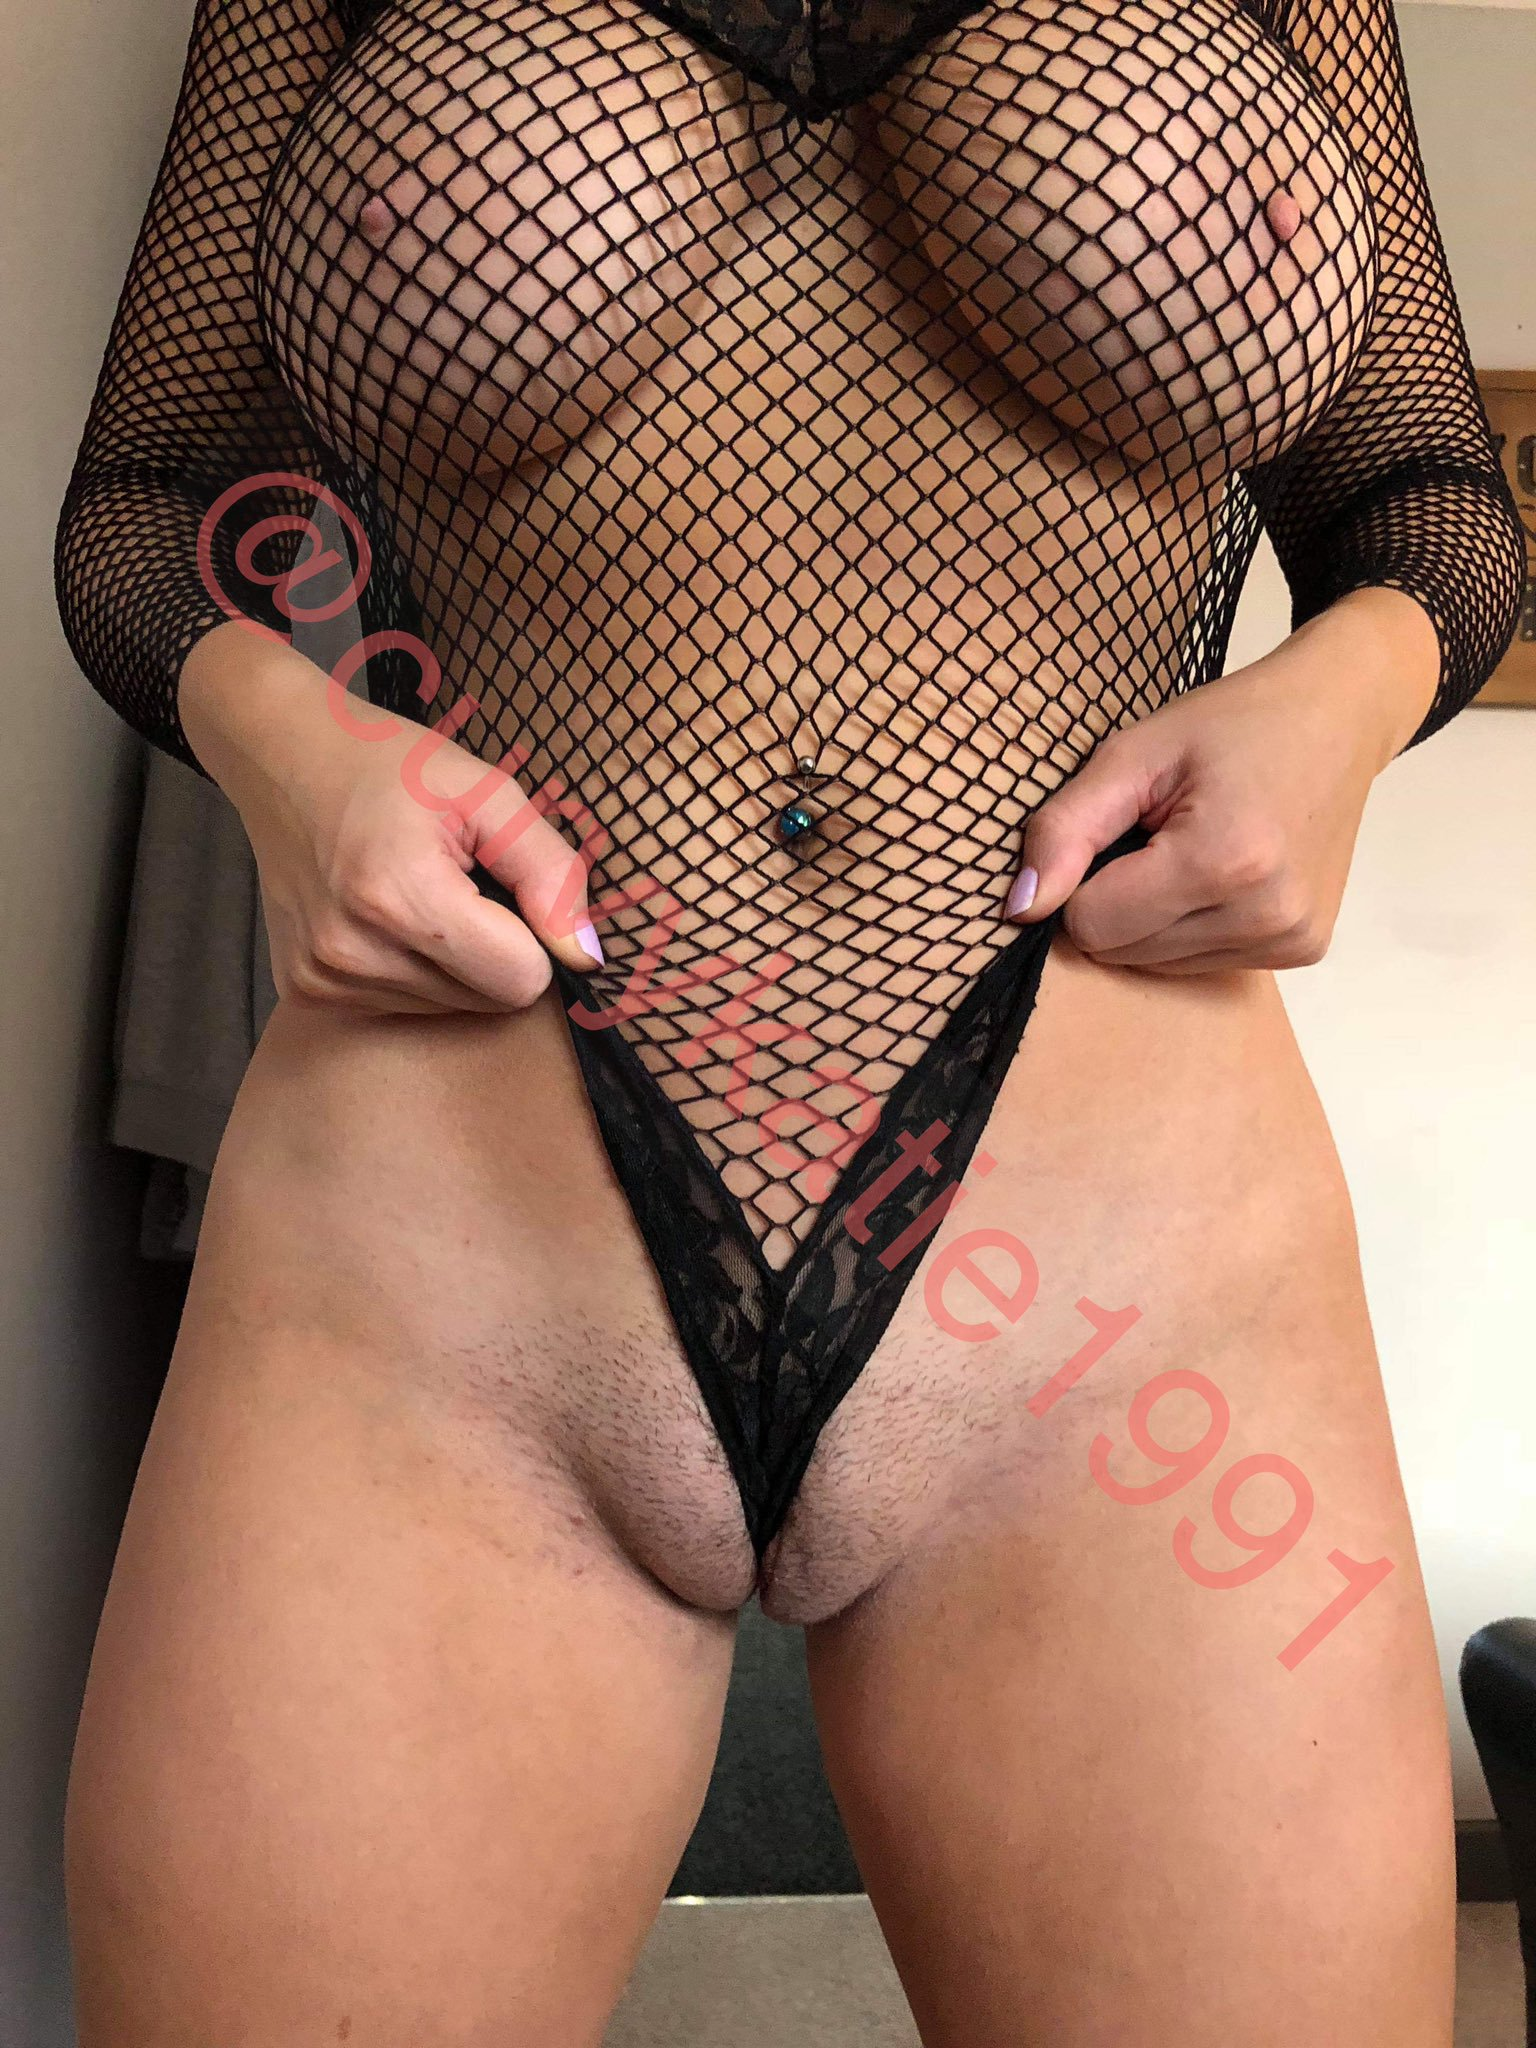 Lindsey Bubblgummbabe Sex Tape & Nude Leaked! 0005